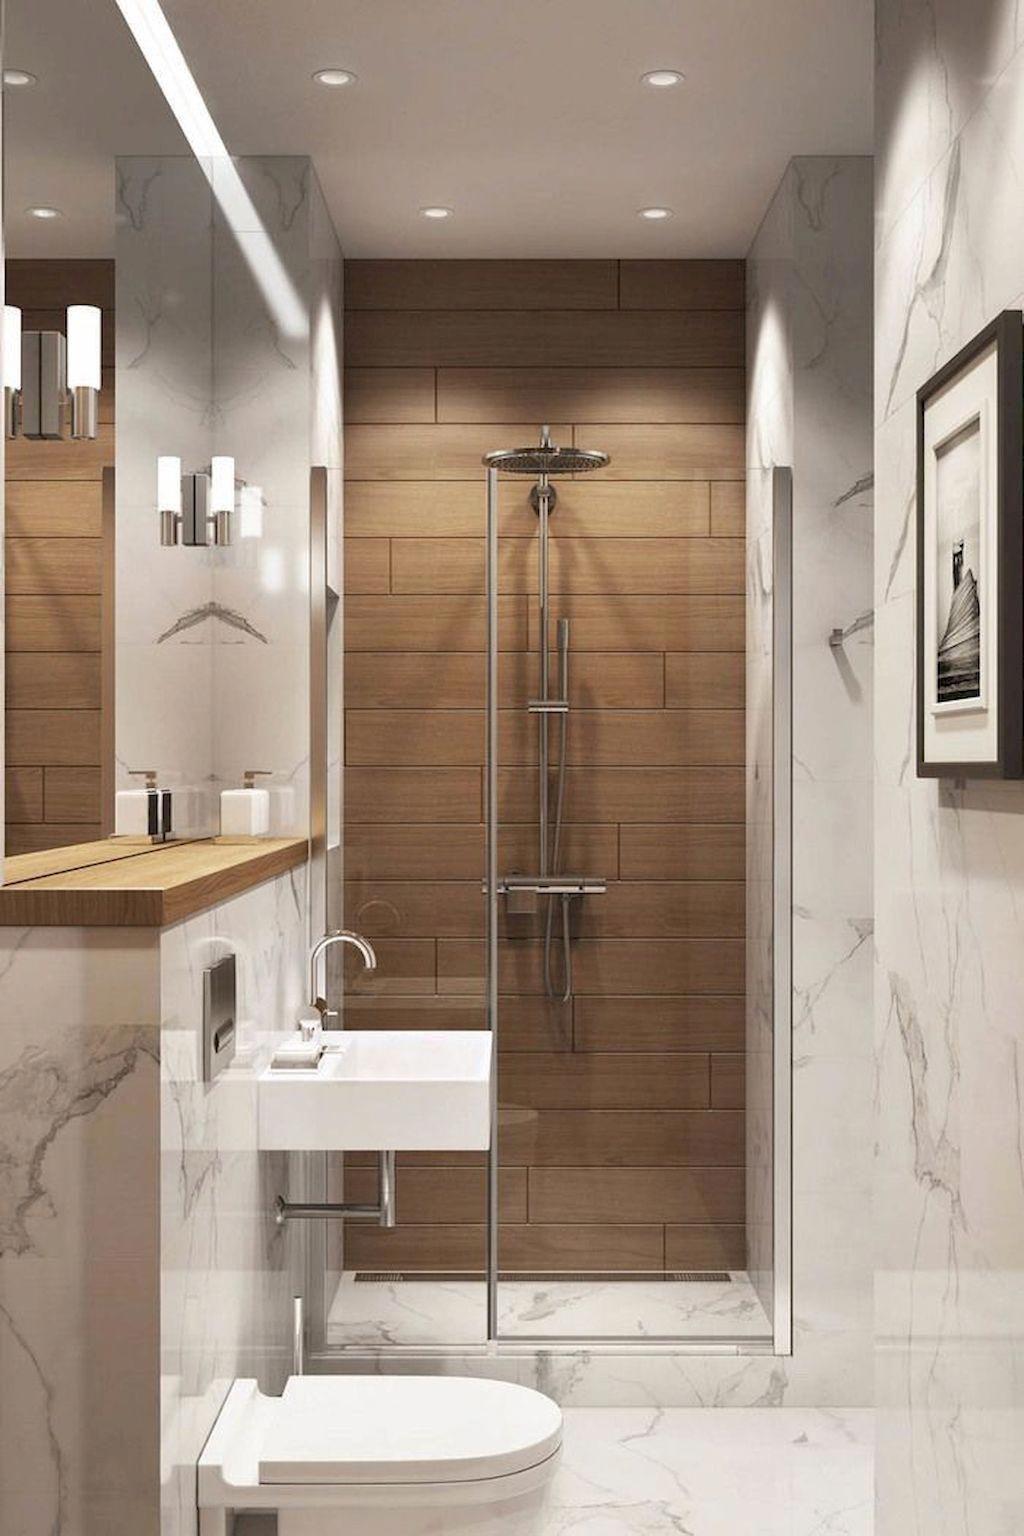 Wooden Bathroom Accessories Dark Blue Bathroom Decor Navy Blue Bathroom Accessories Set Renovasi Kamar Mandi Kecil Desain Kamar Mandi Kecil Ide Kamar Mandi